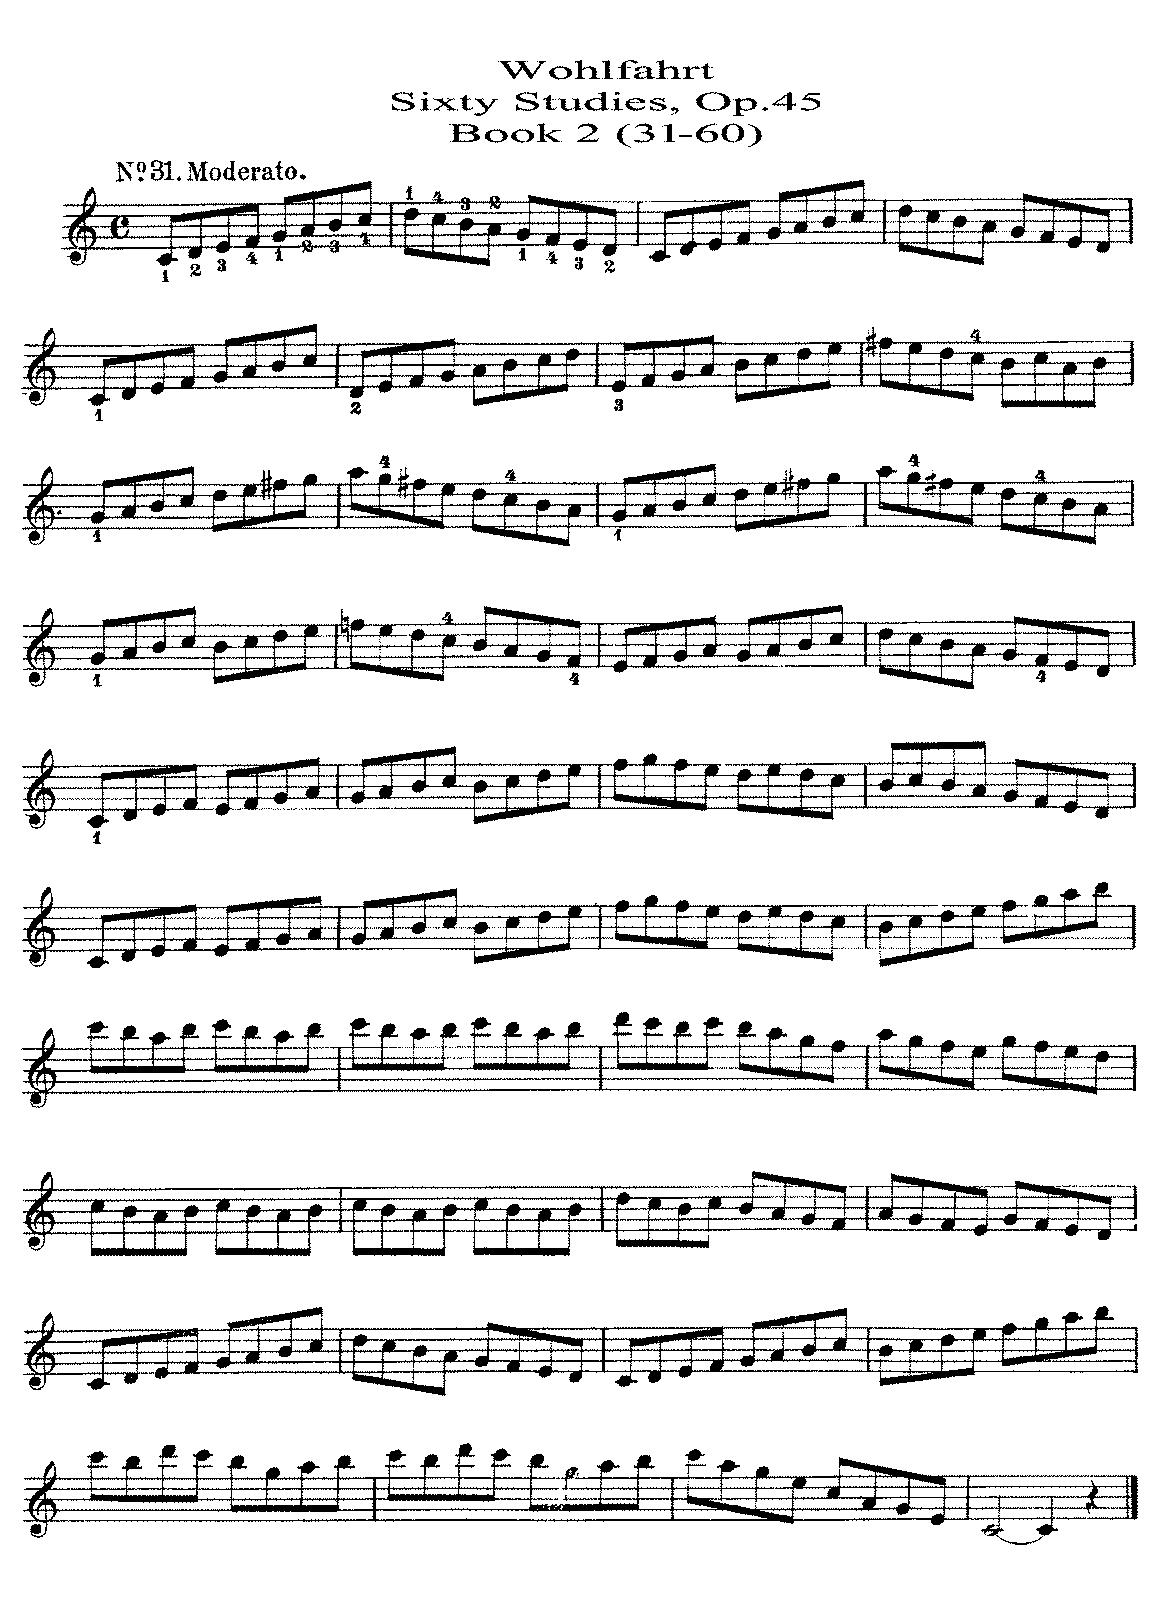 Suzuki Violin Etude Words